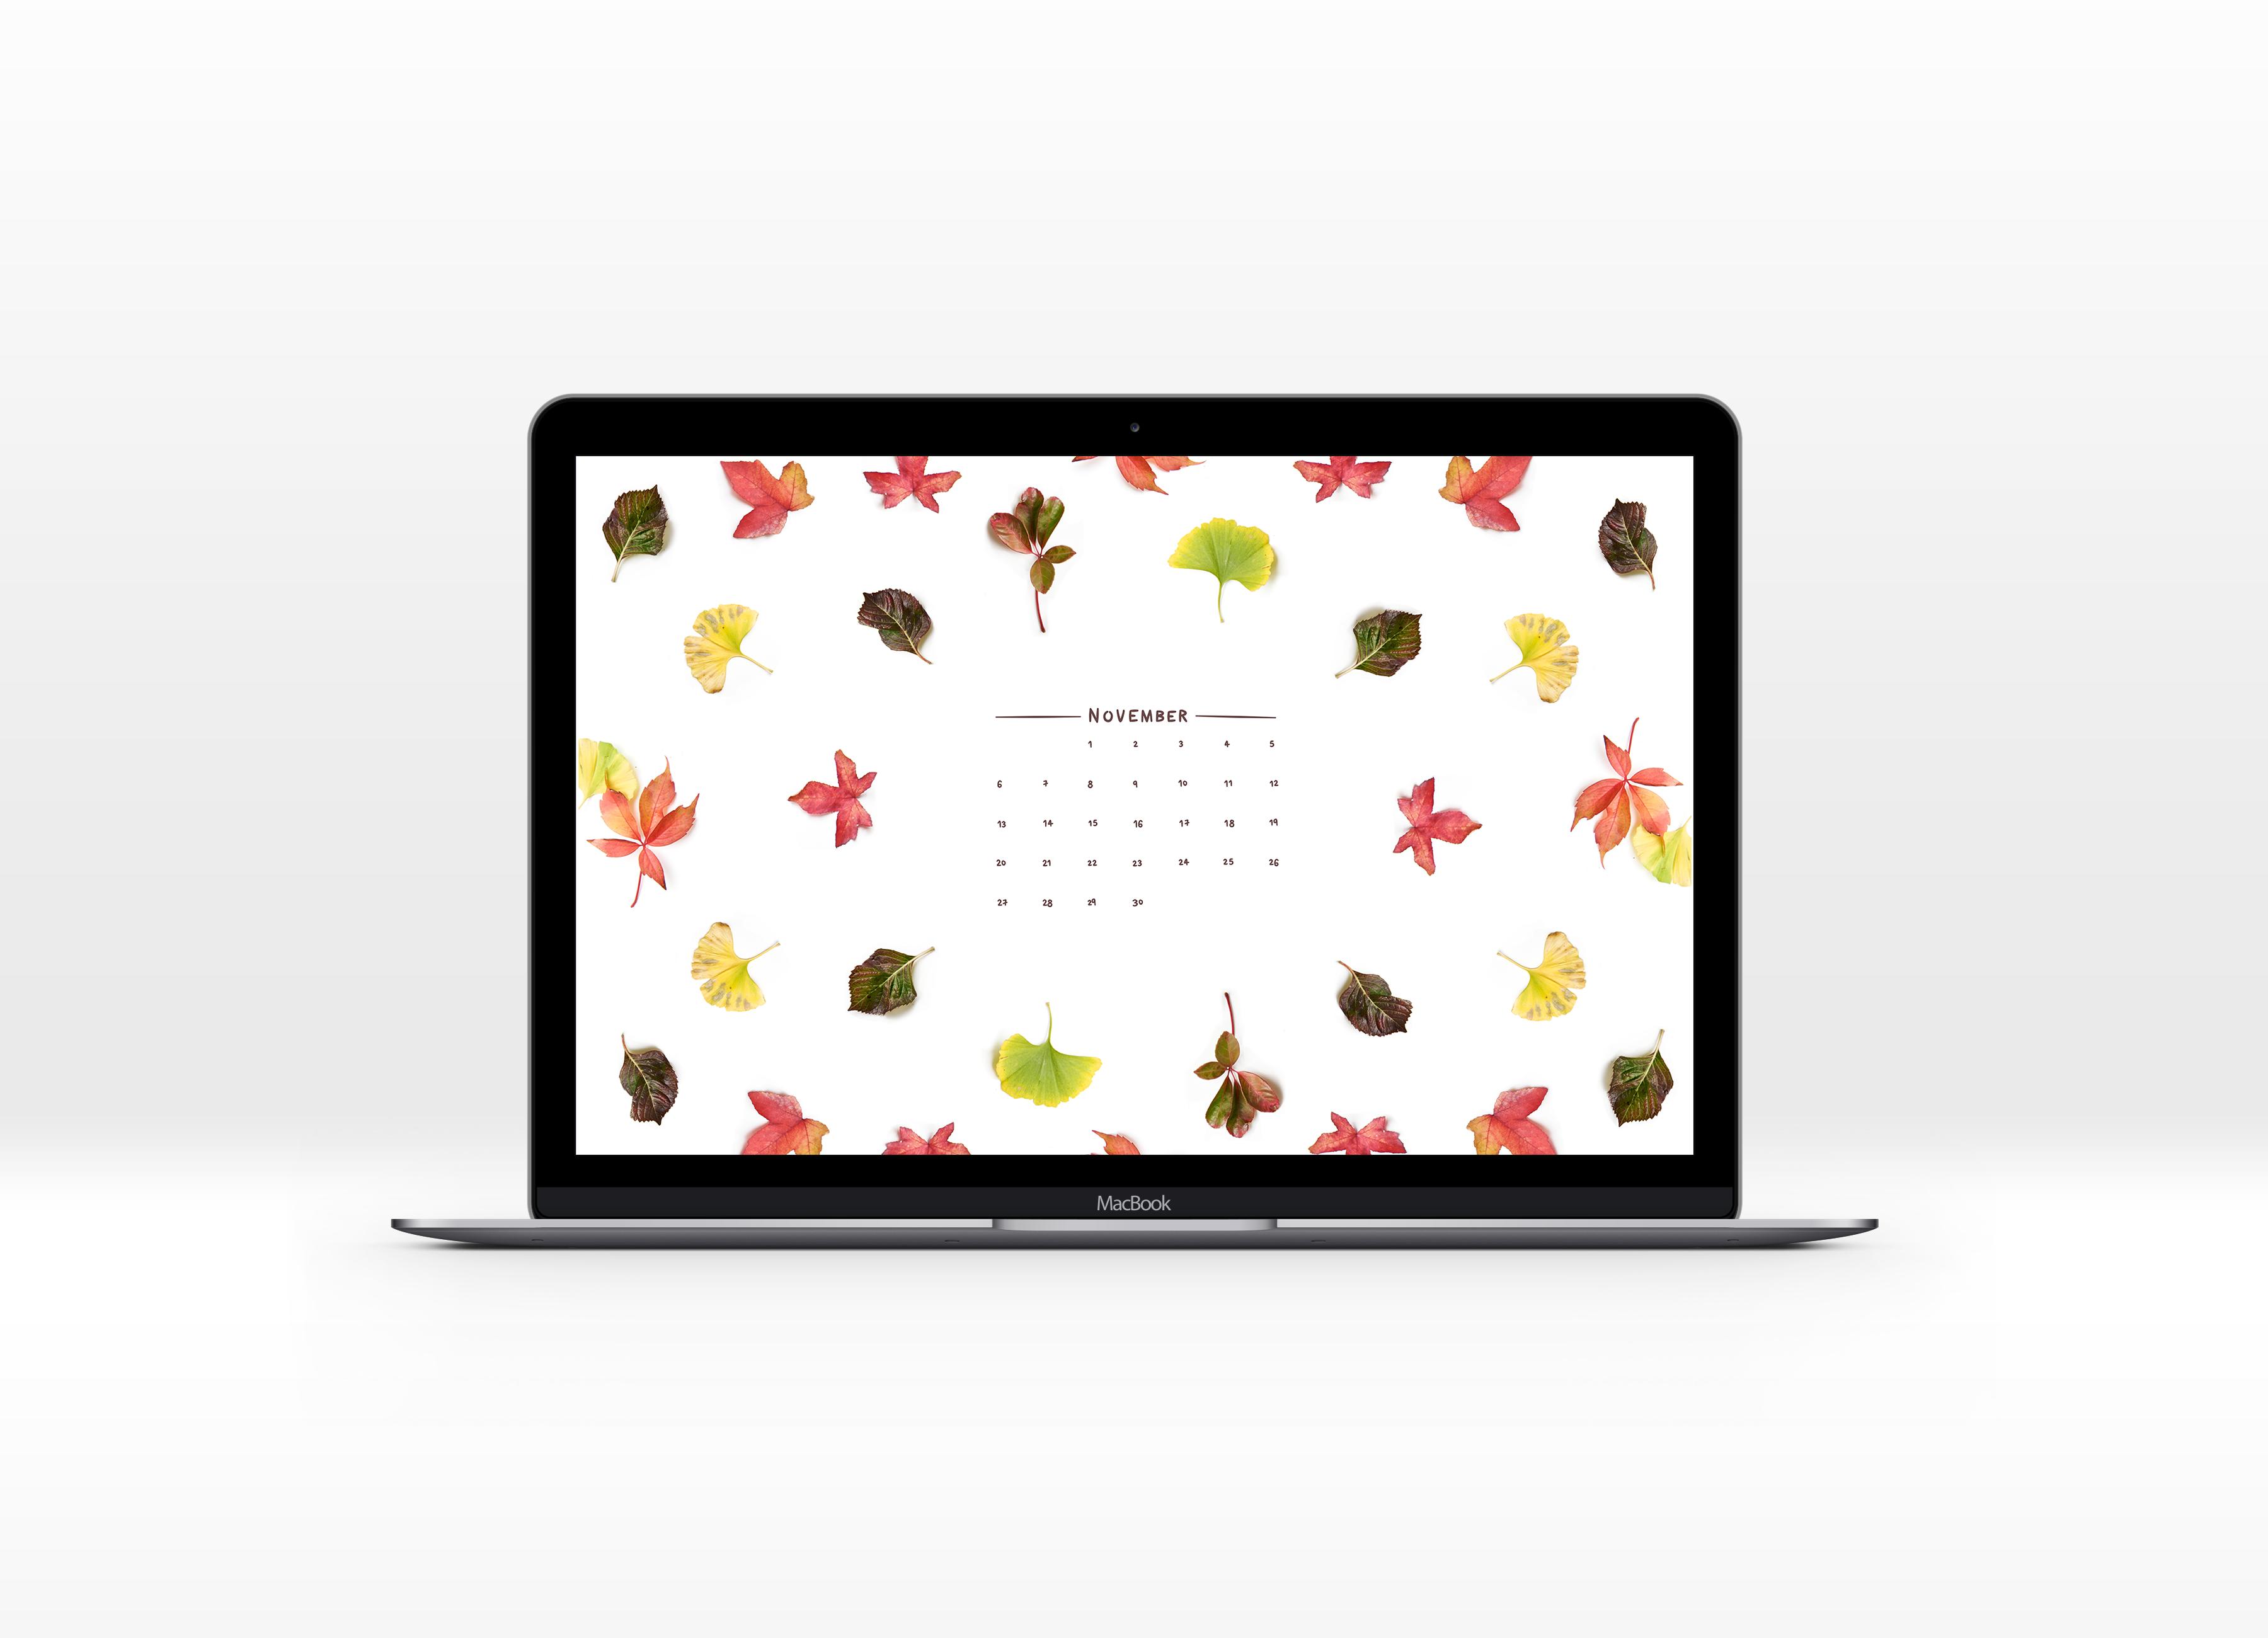 FREE downloadable november desktop background wallpaper